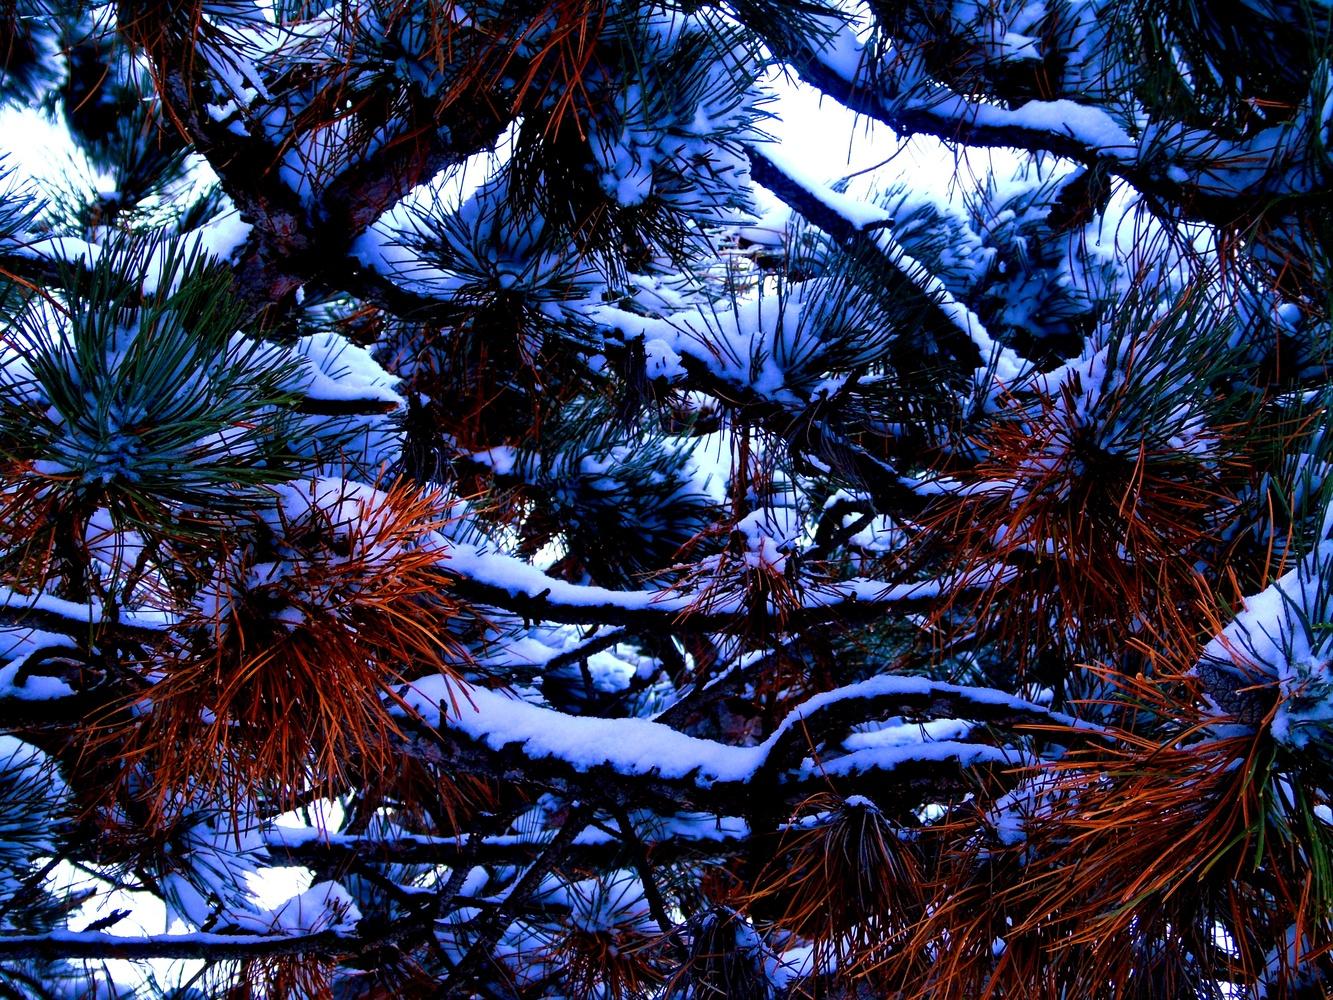 Winter's Day by Gail Jordan